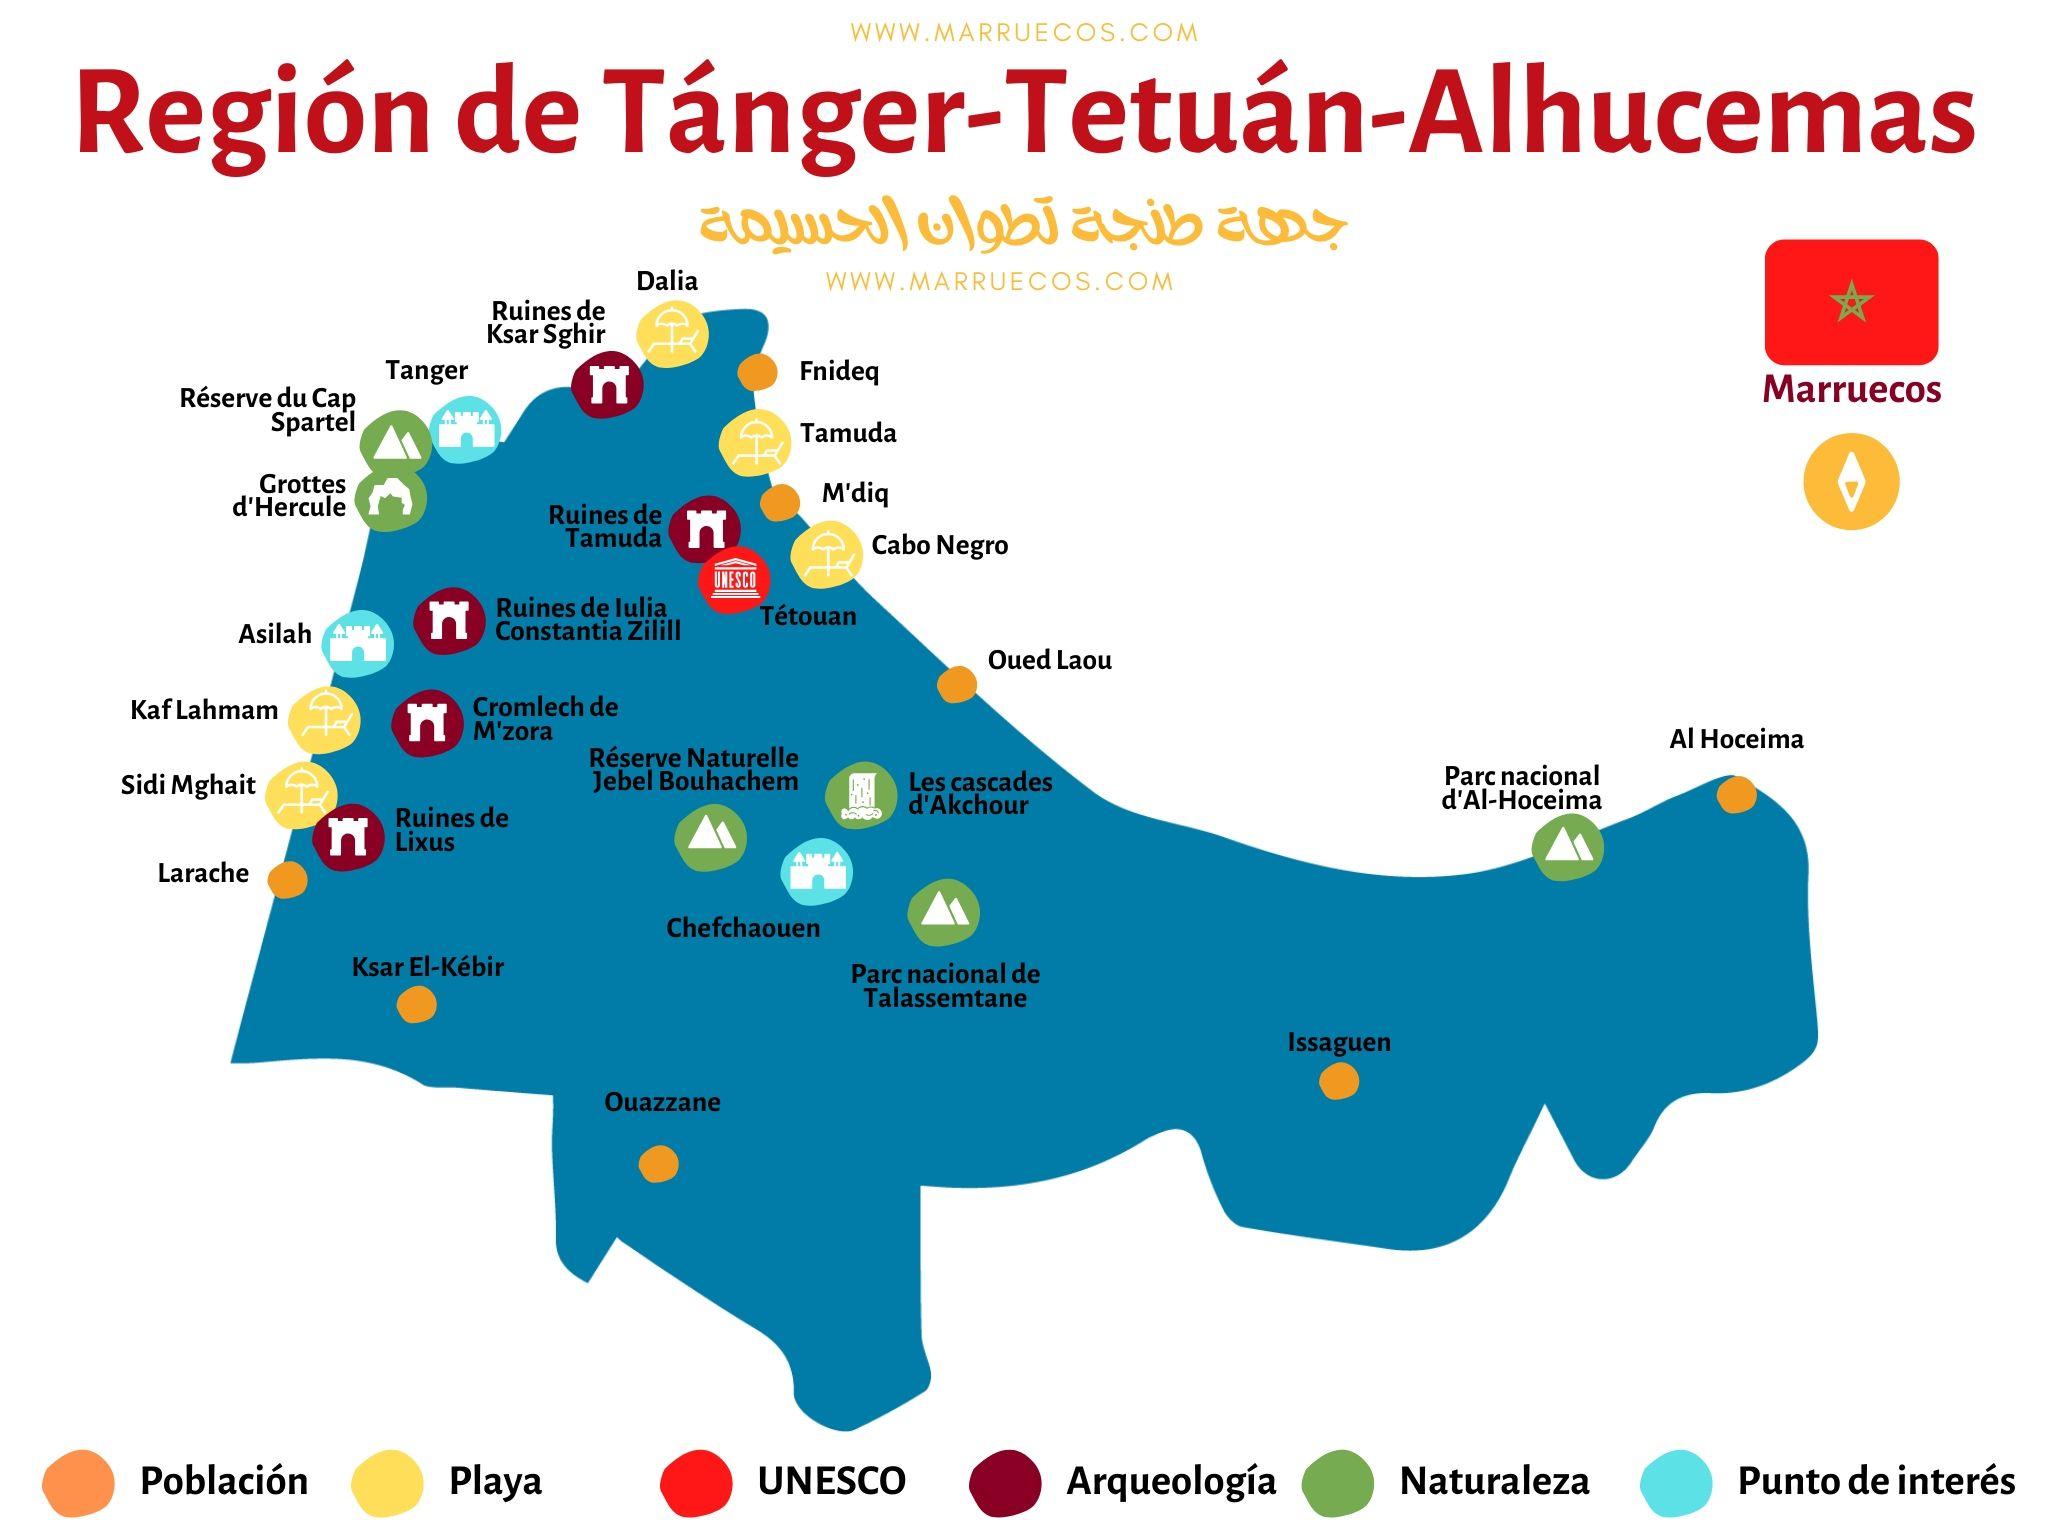 Mapa Region Tanger-Tetuan-Alhucemas en Marruecos